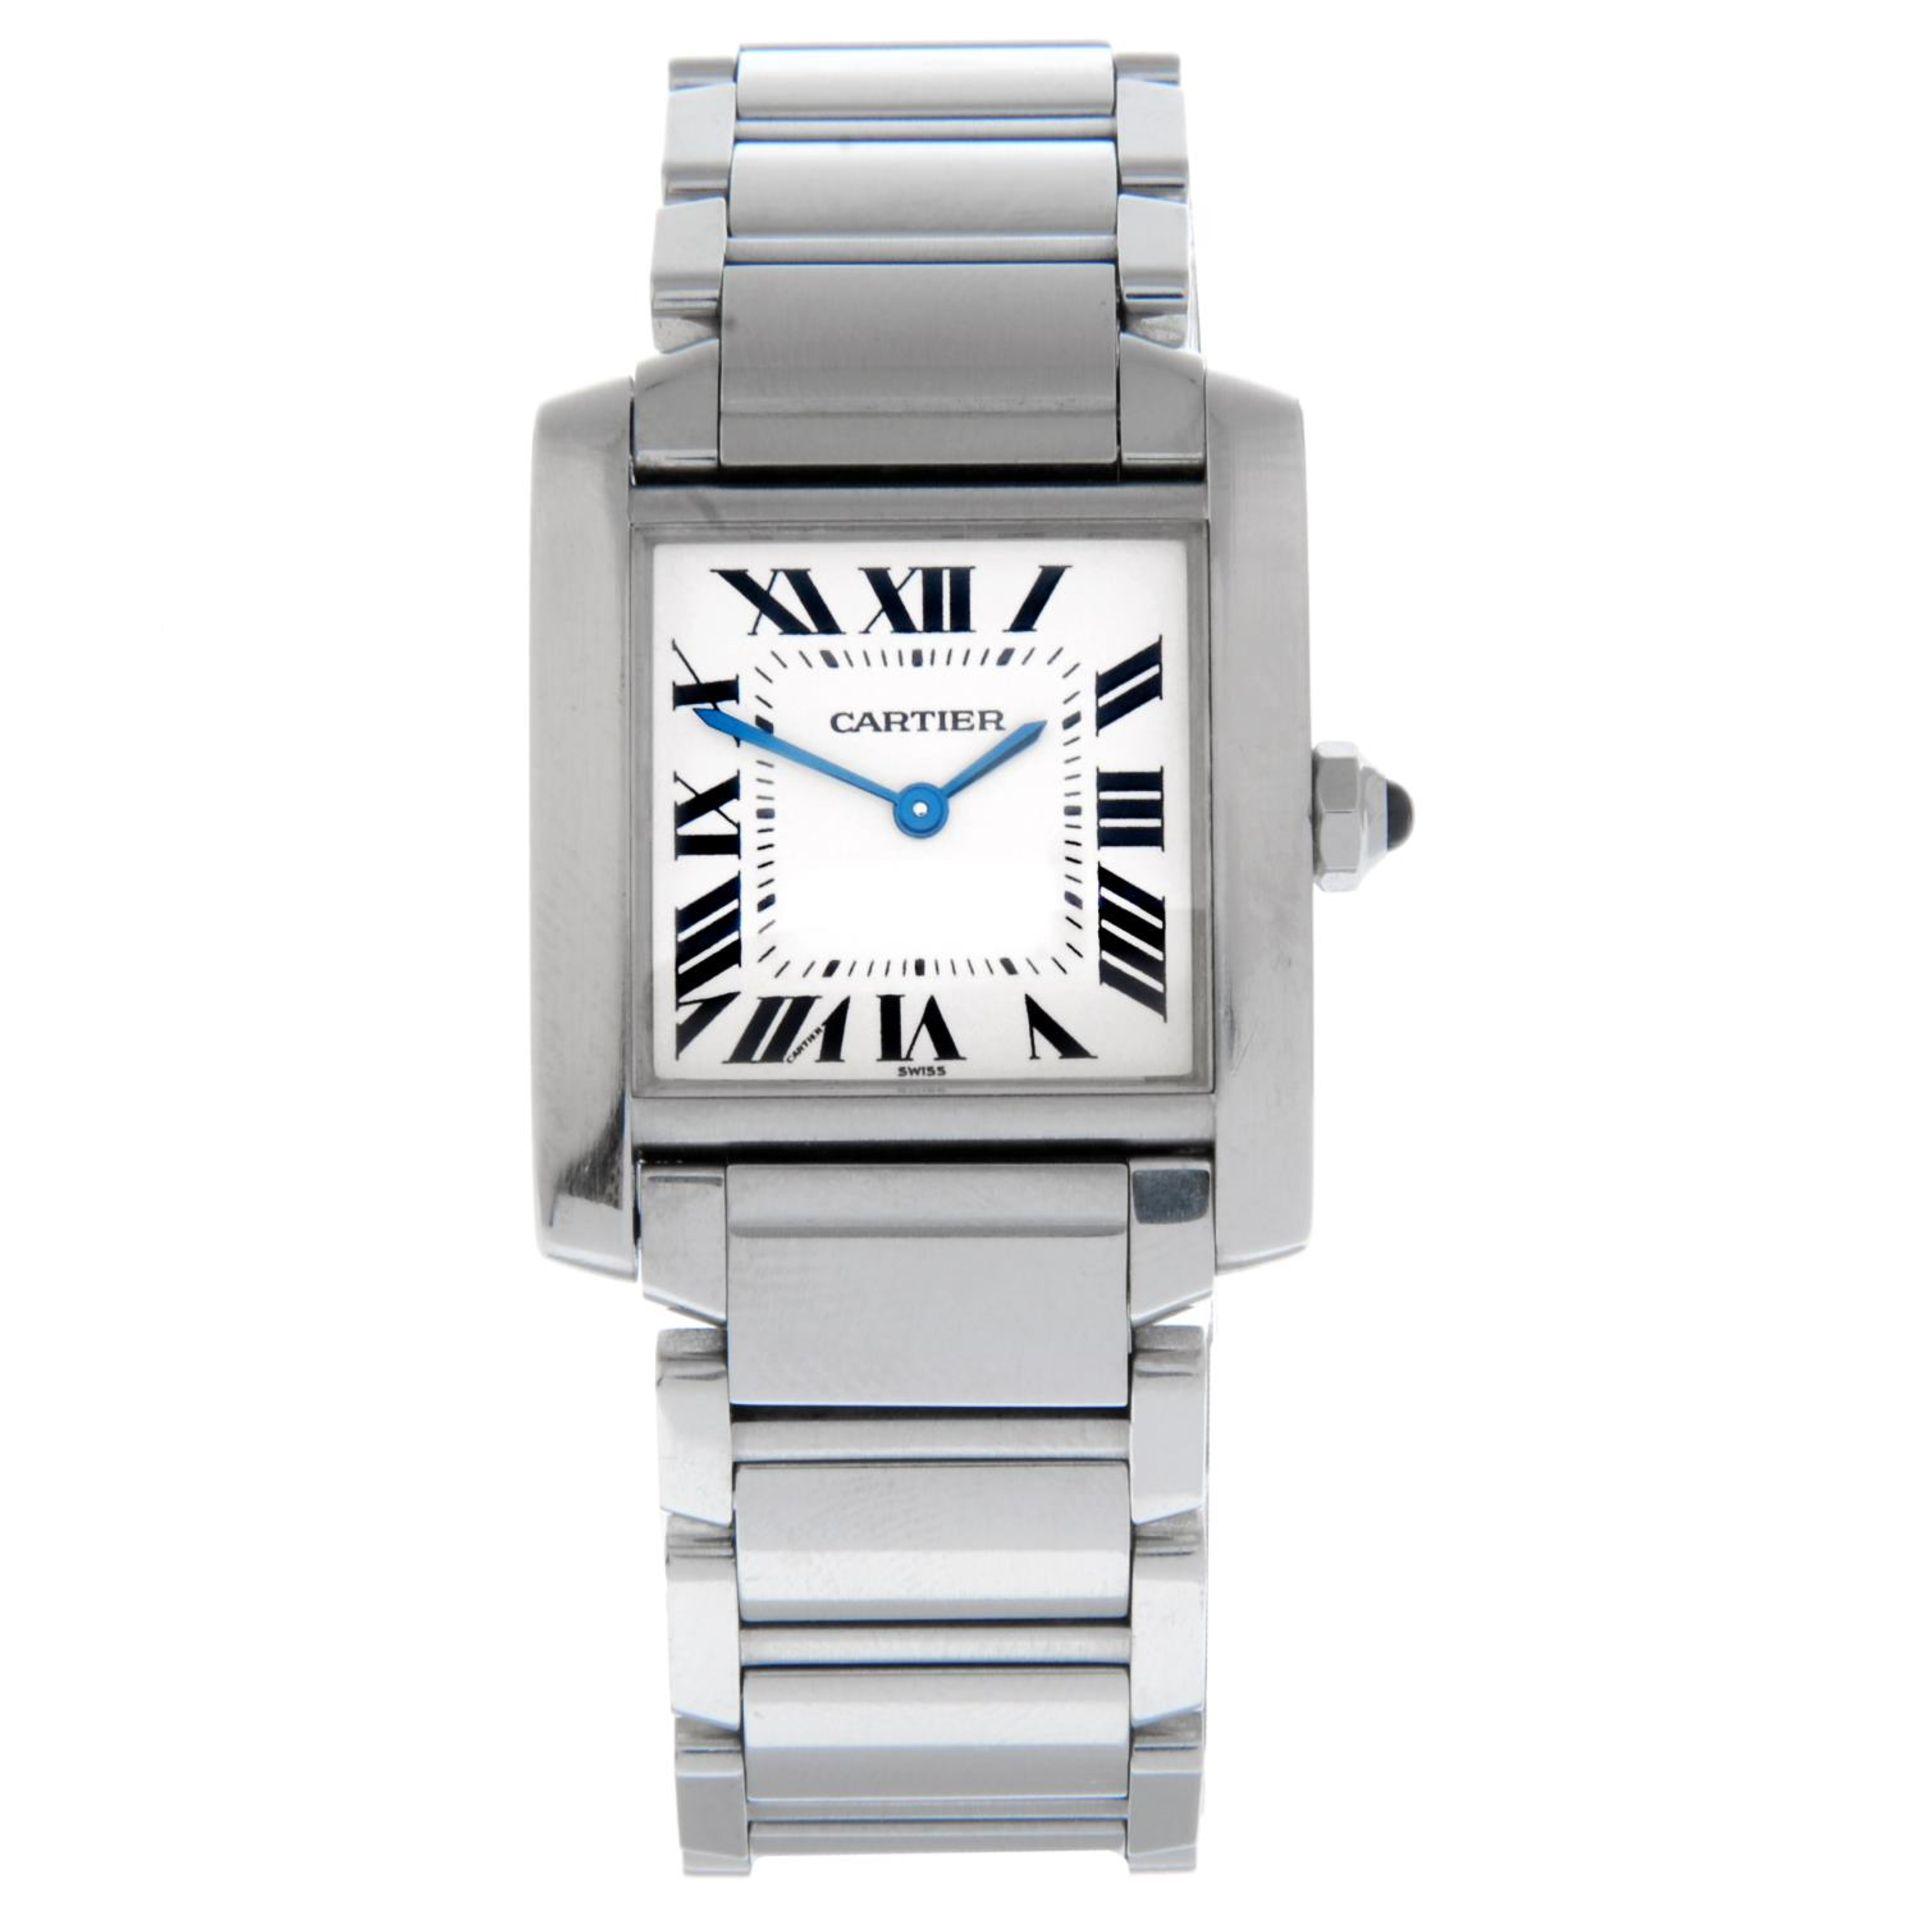 CARTIER - a Tank Francaise bracelet watch.